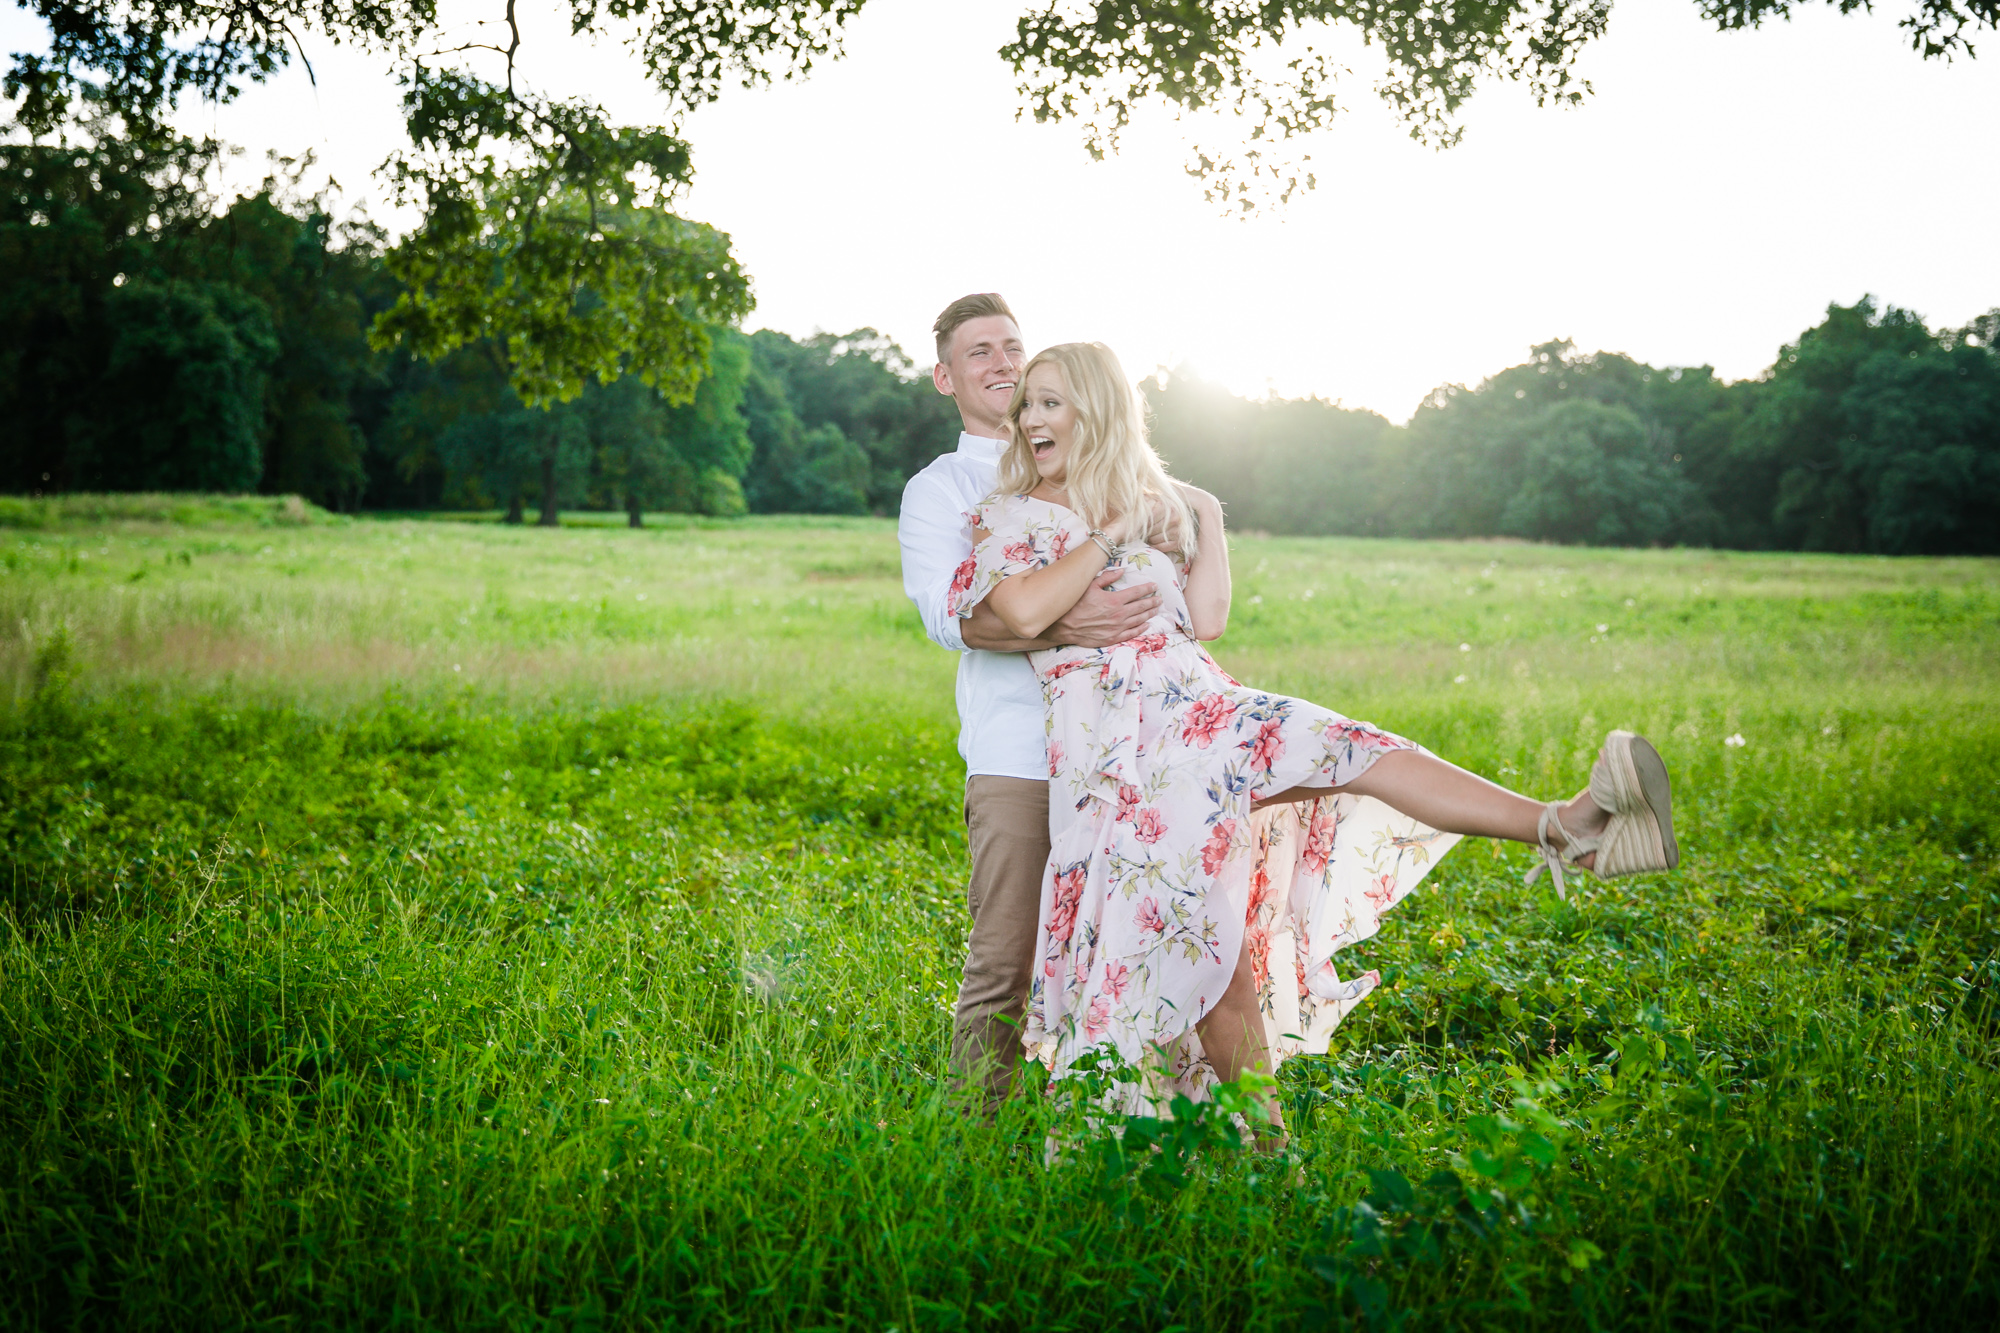 Amanda and Chris - Engagmenet Photos - Valley Forge Park - 026.jpg